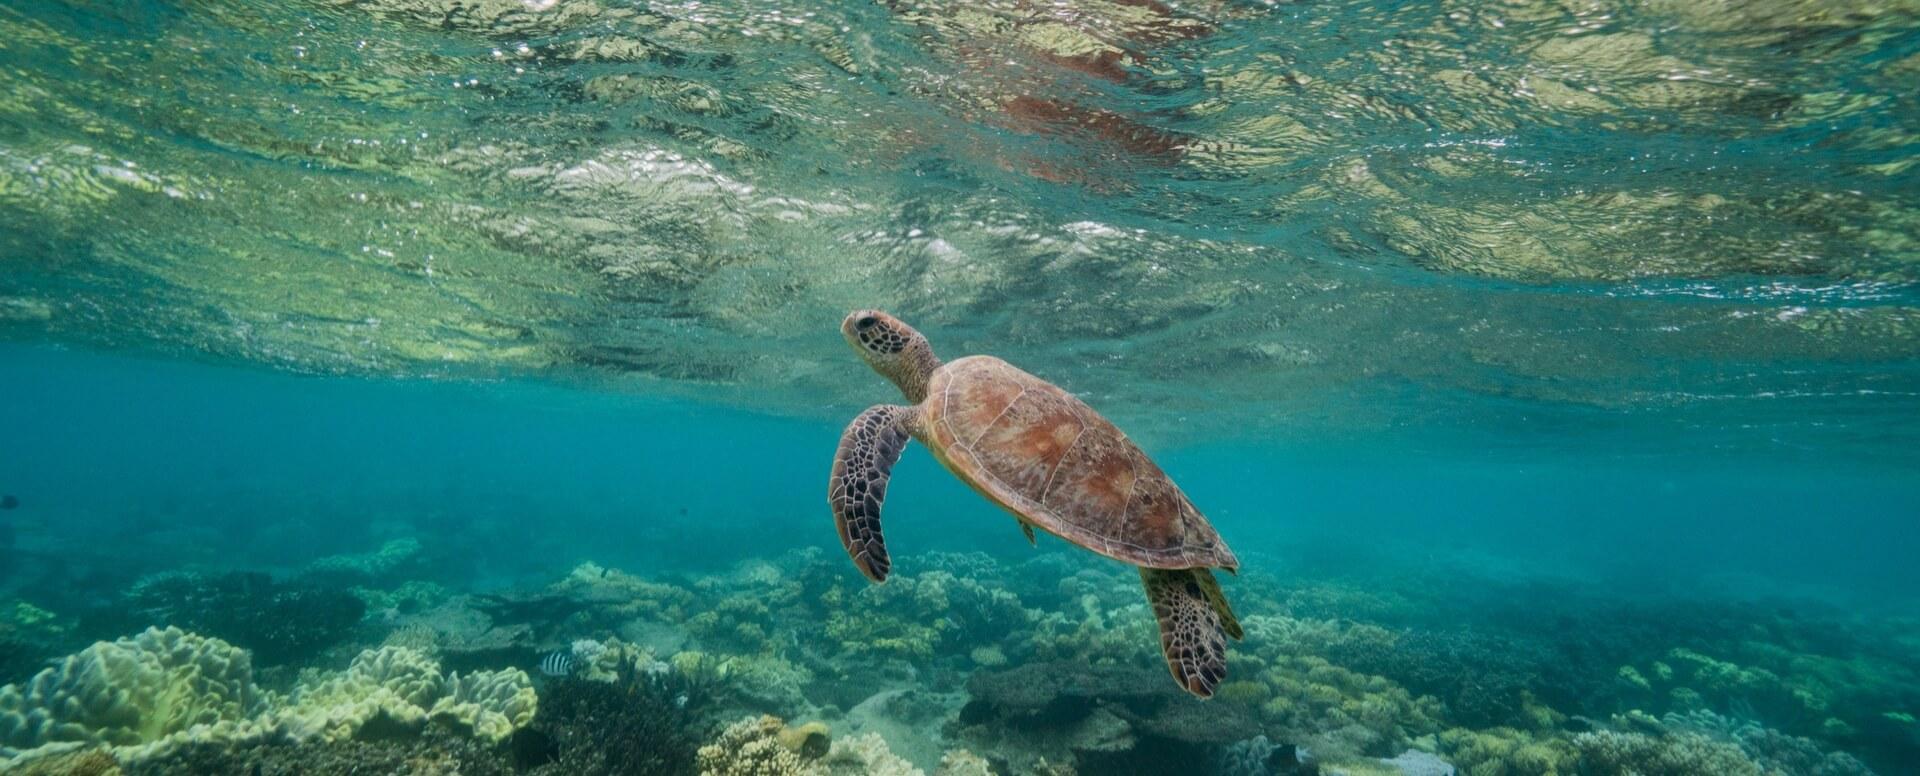 6- Essayez la plongée sous-marine - Bali